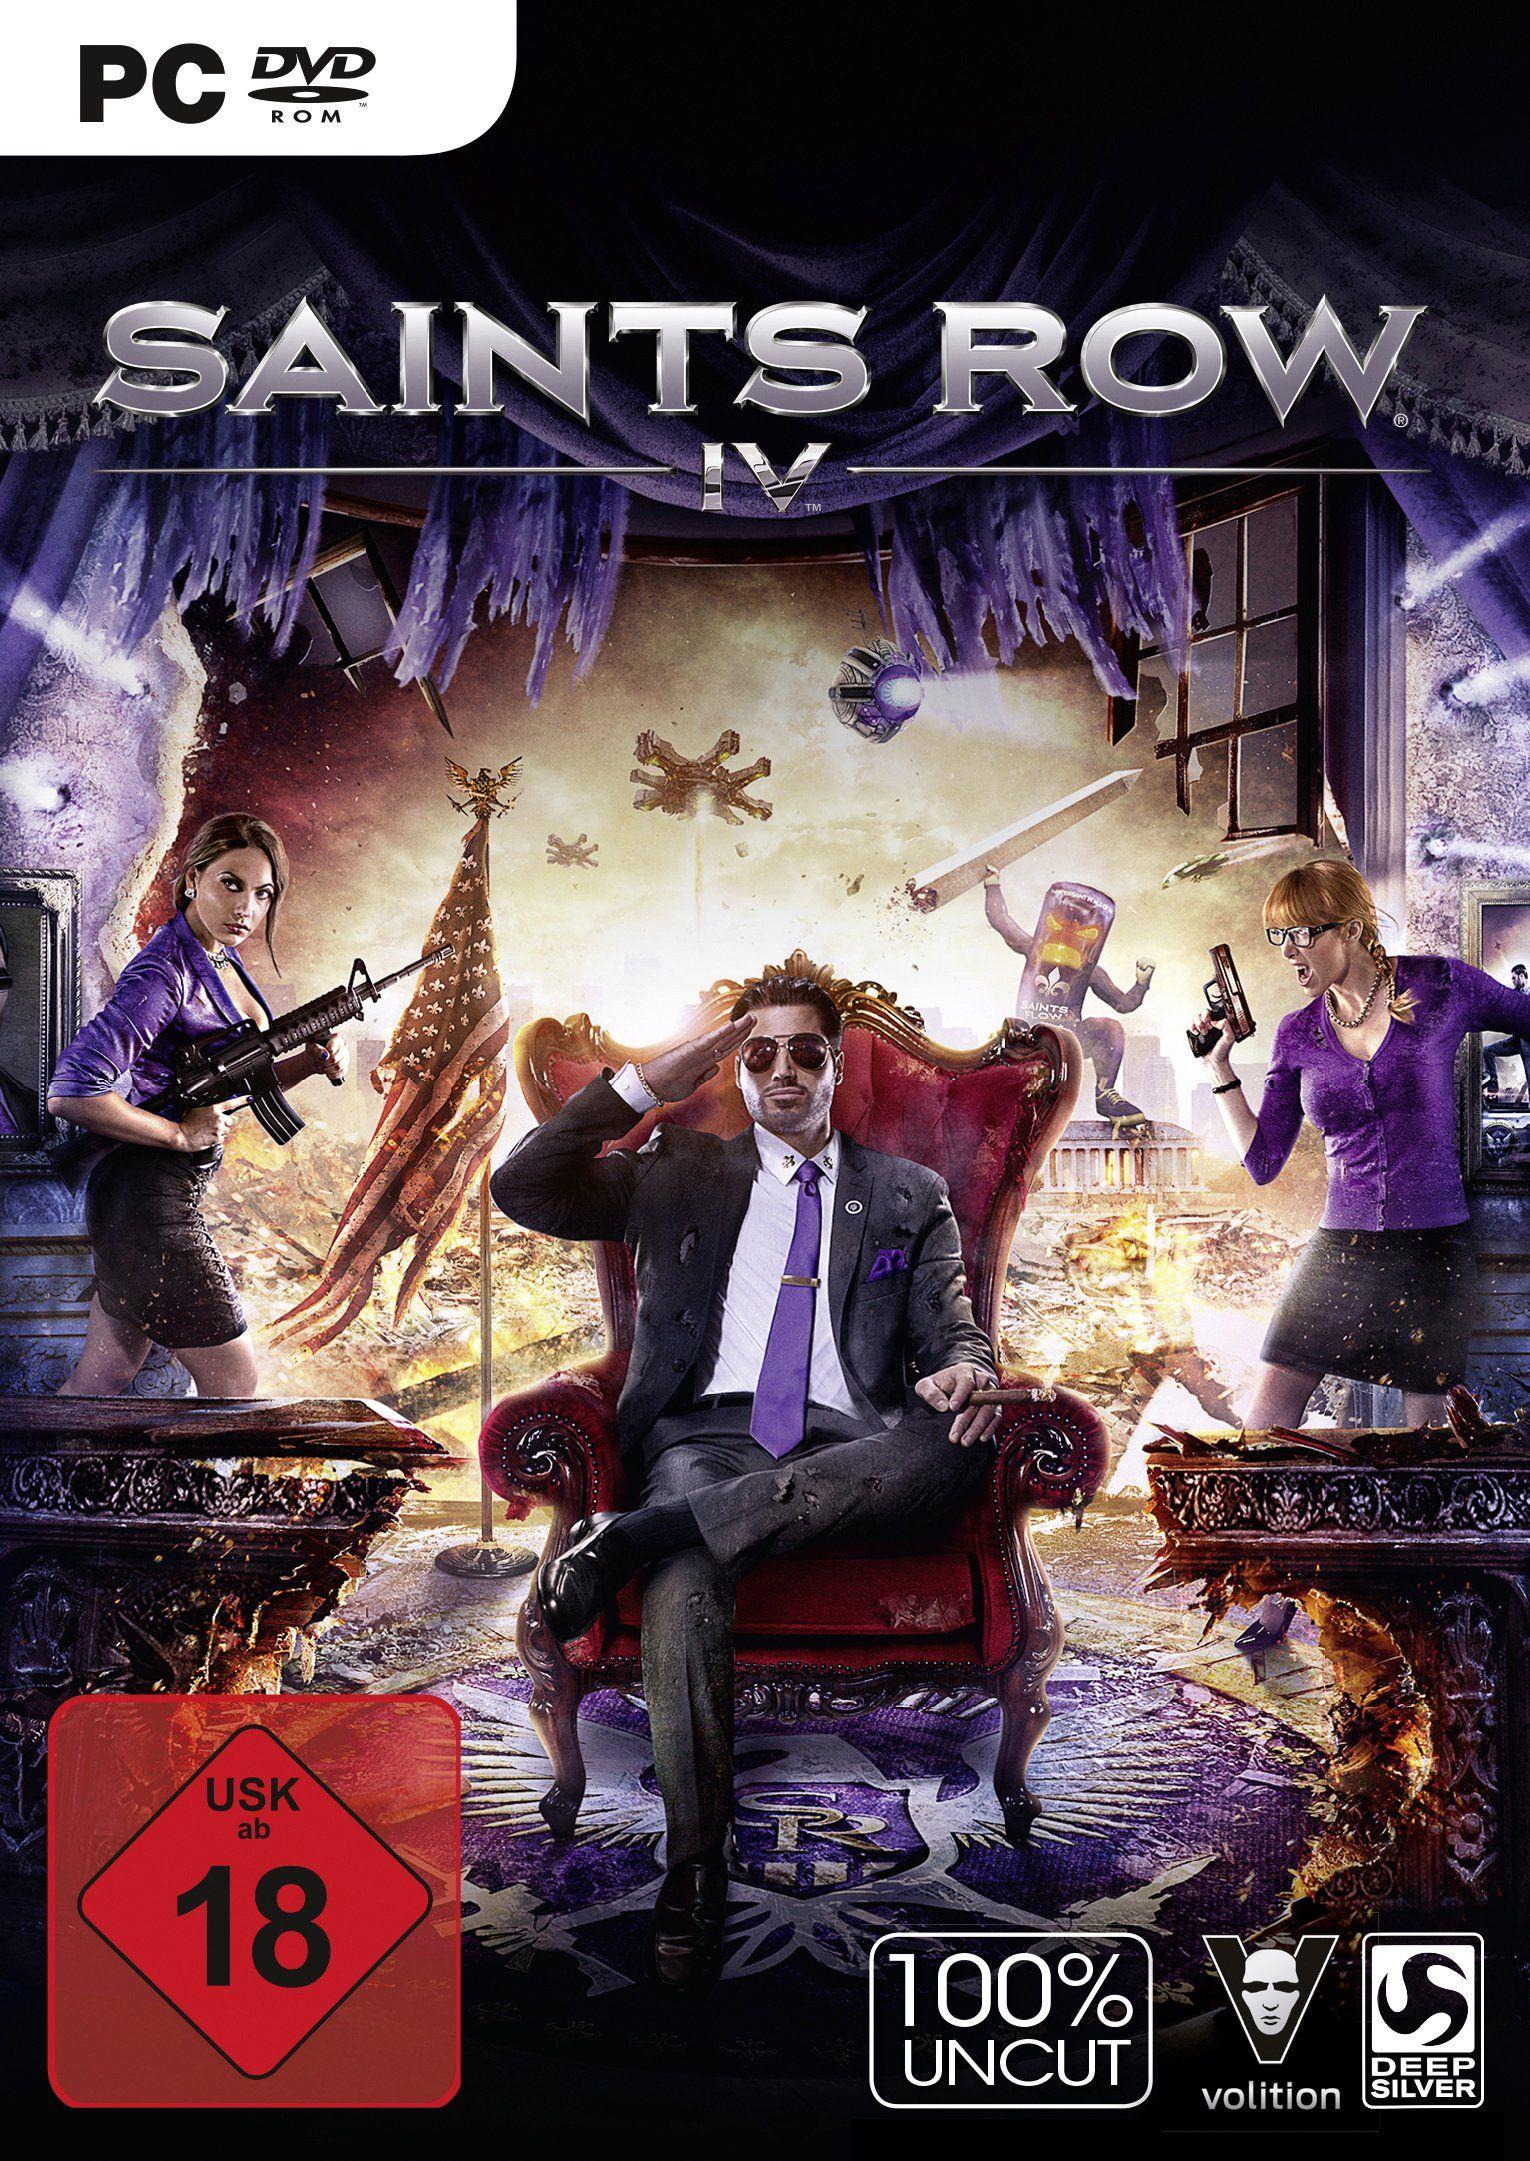 saints row iv 100 uncut playstation 3. Black Bedroom Furniture Sets. Home Design Ideas